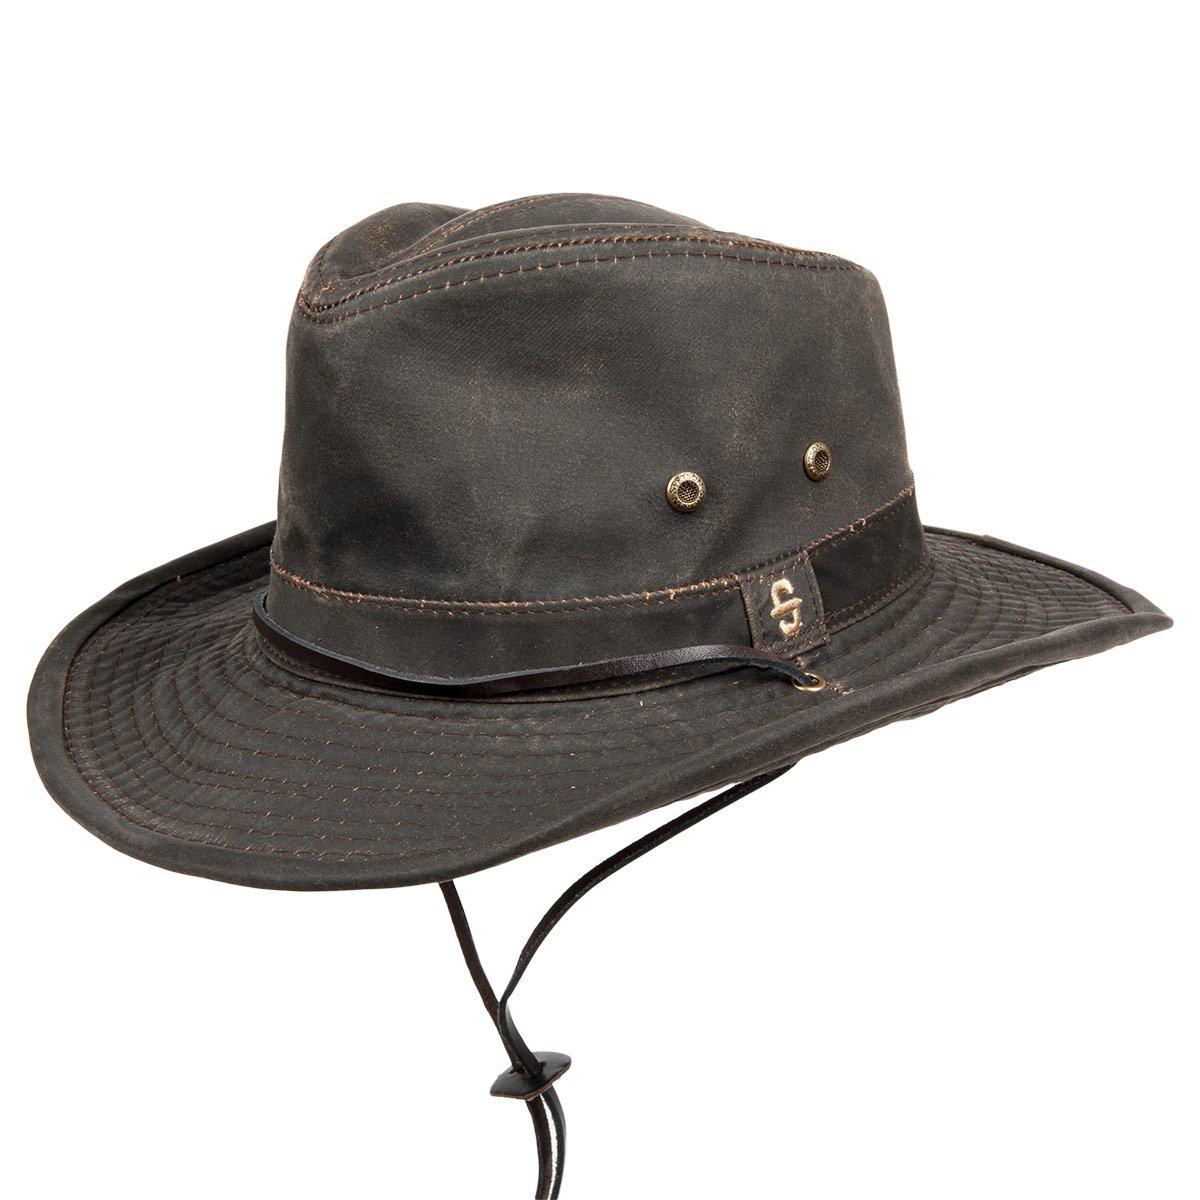 STETSON | cappello outdoor Diaz cotton in pelle ecologica